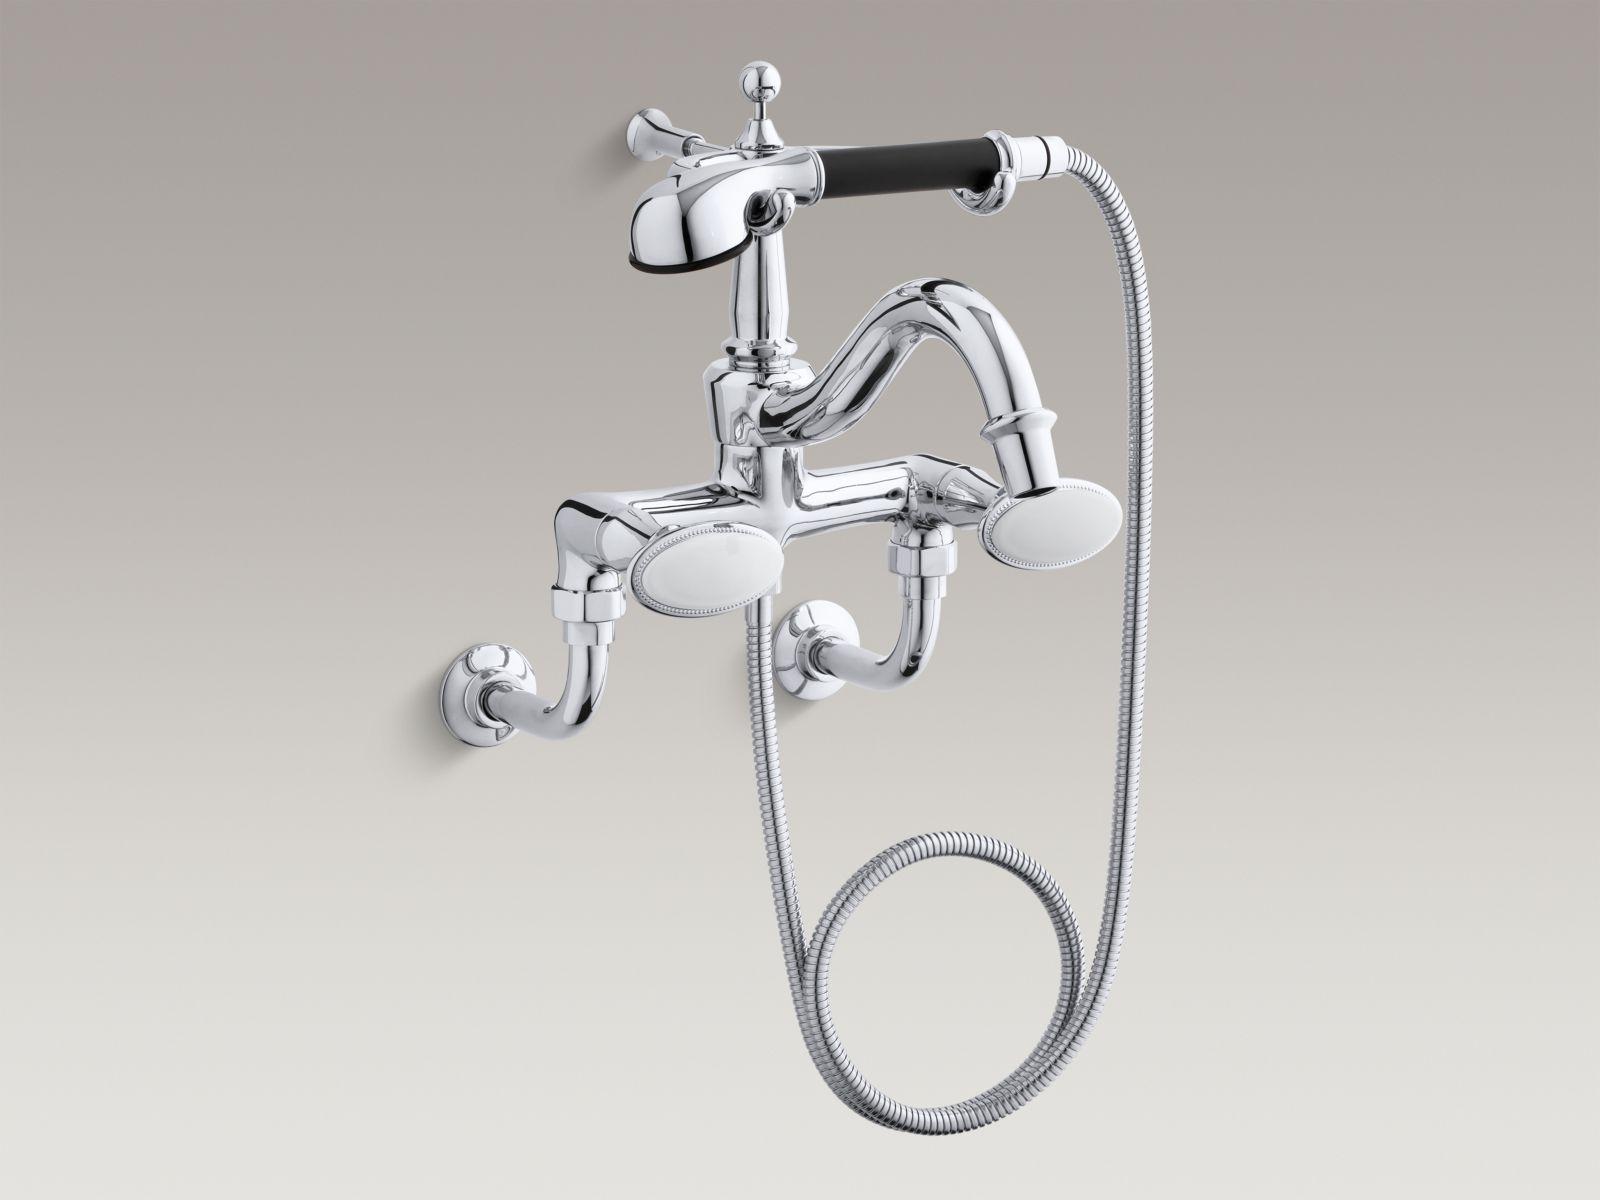 Ideas, kohler bol ceramic faucet kohler bol ceramic faucet buyplumbing category bathroom faucet 1600 x 1200  .